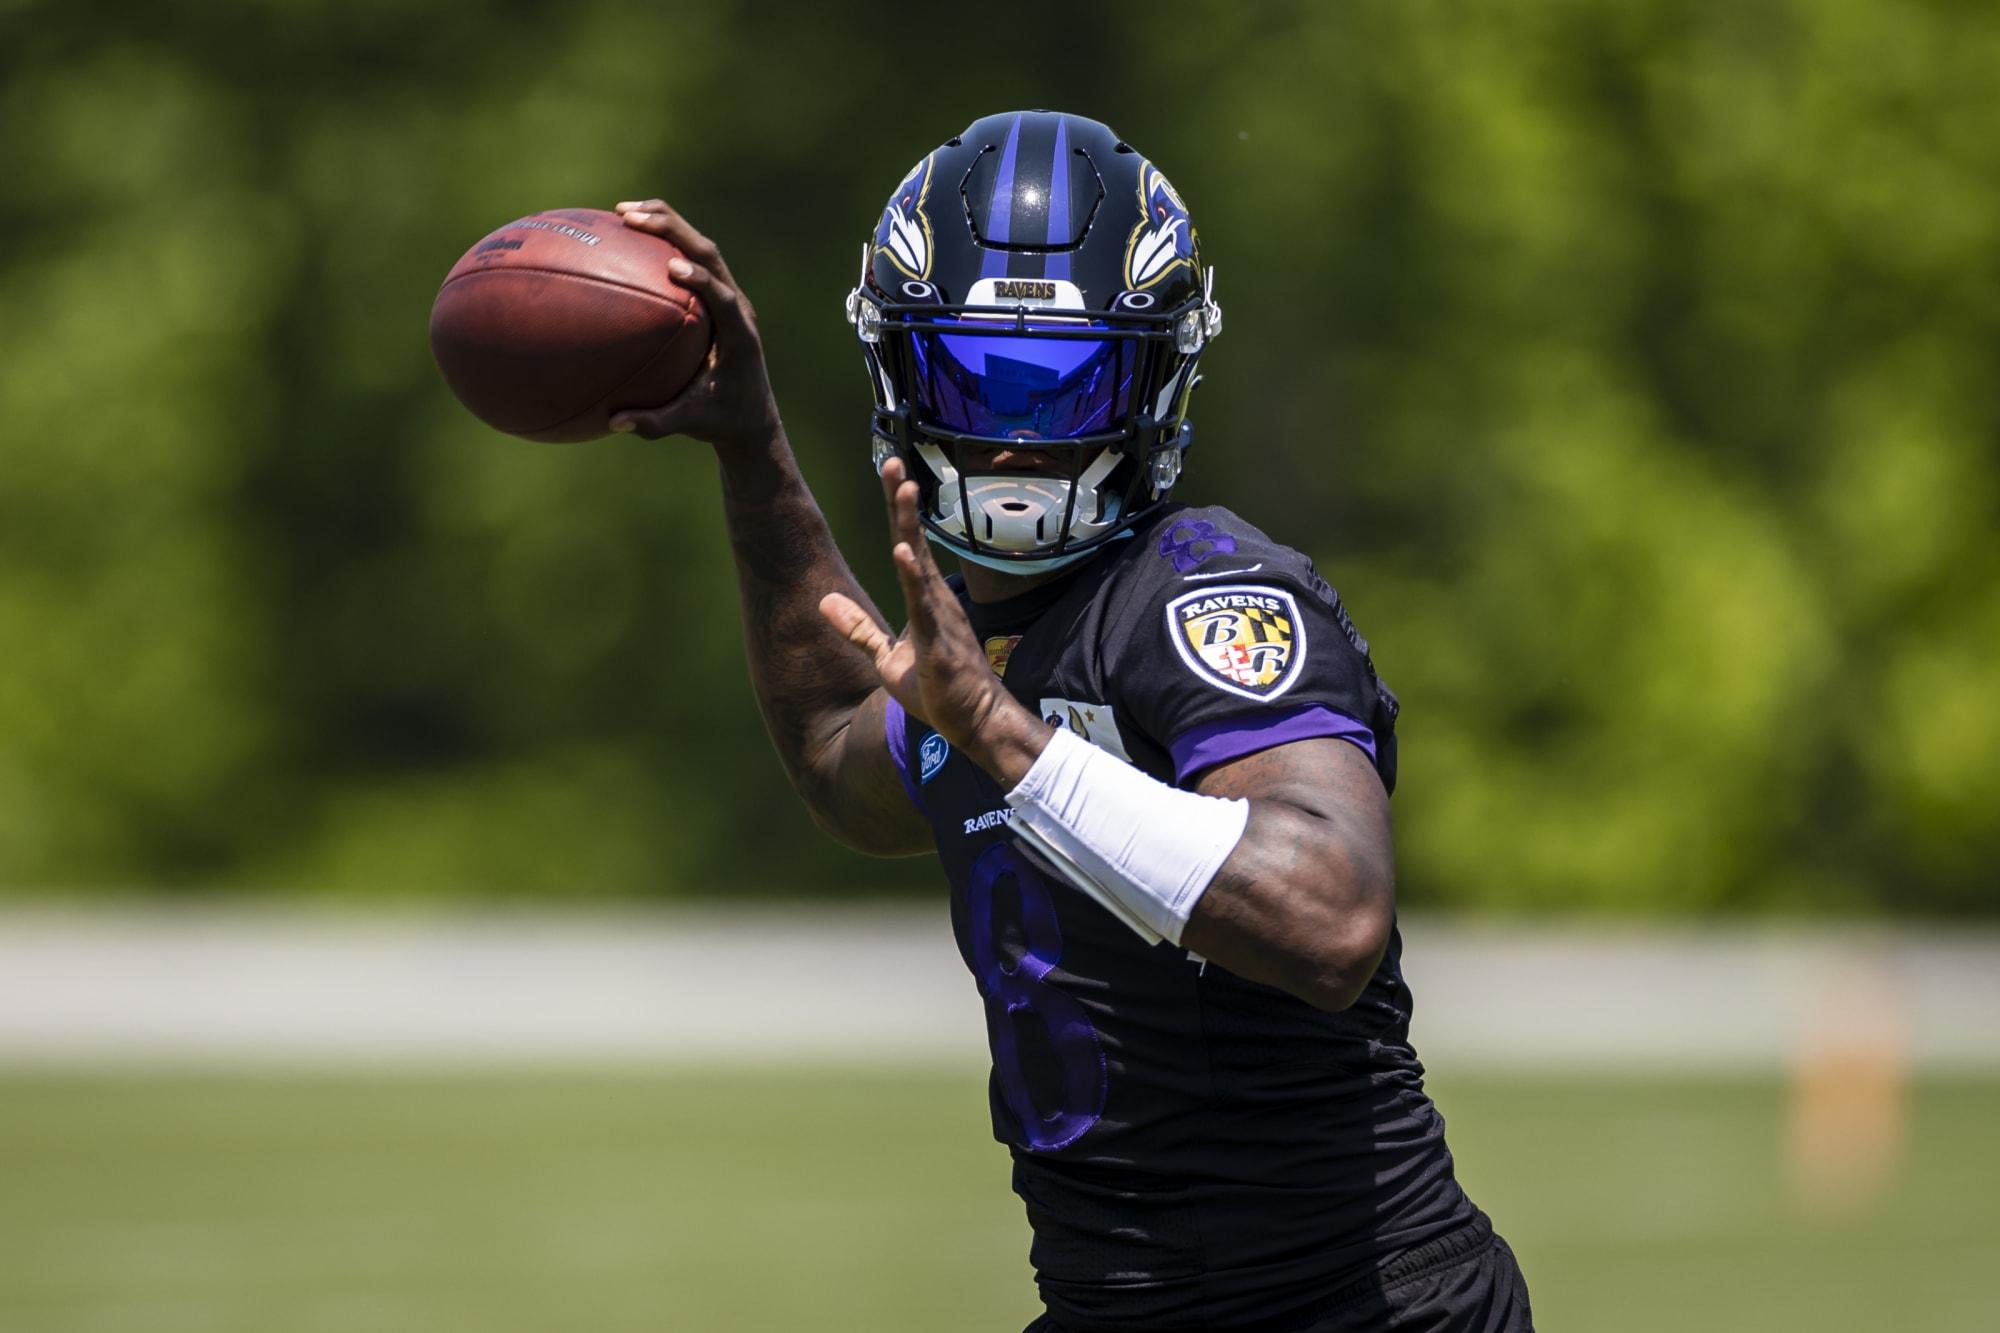 The Ravens aren't letting media film Lamar Jackson throws anymore